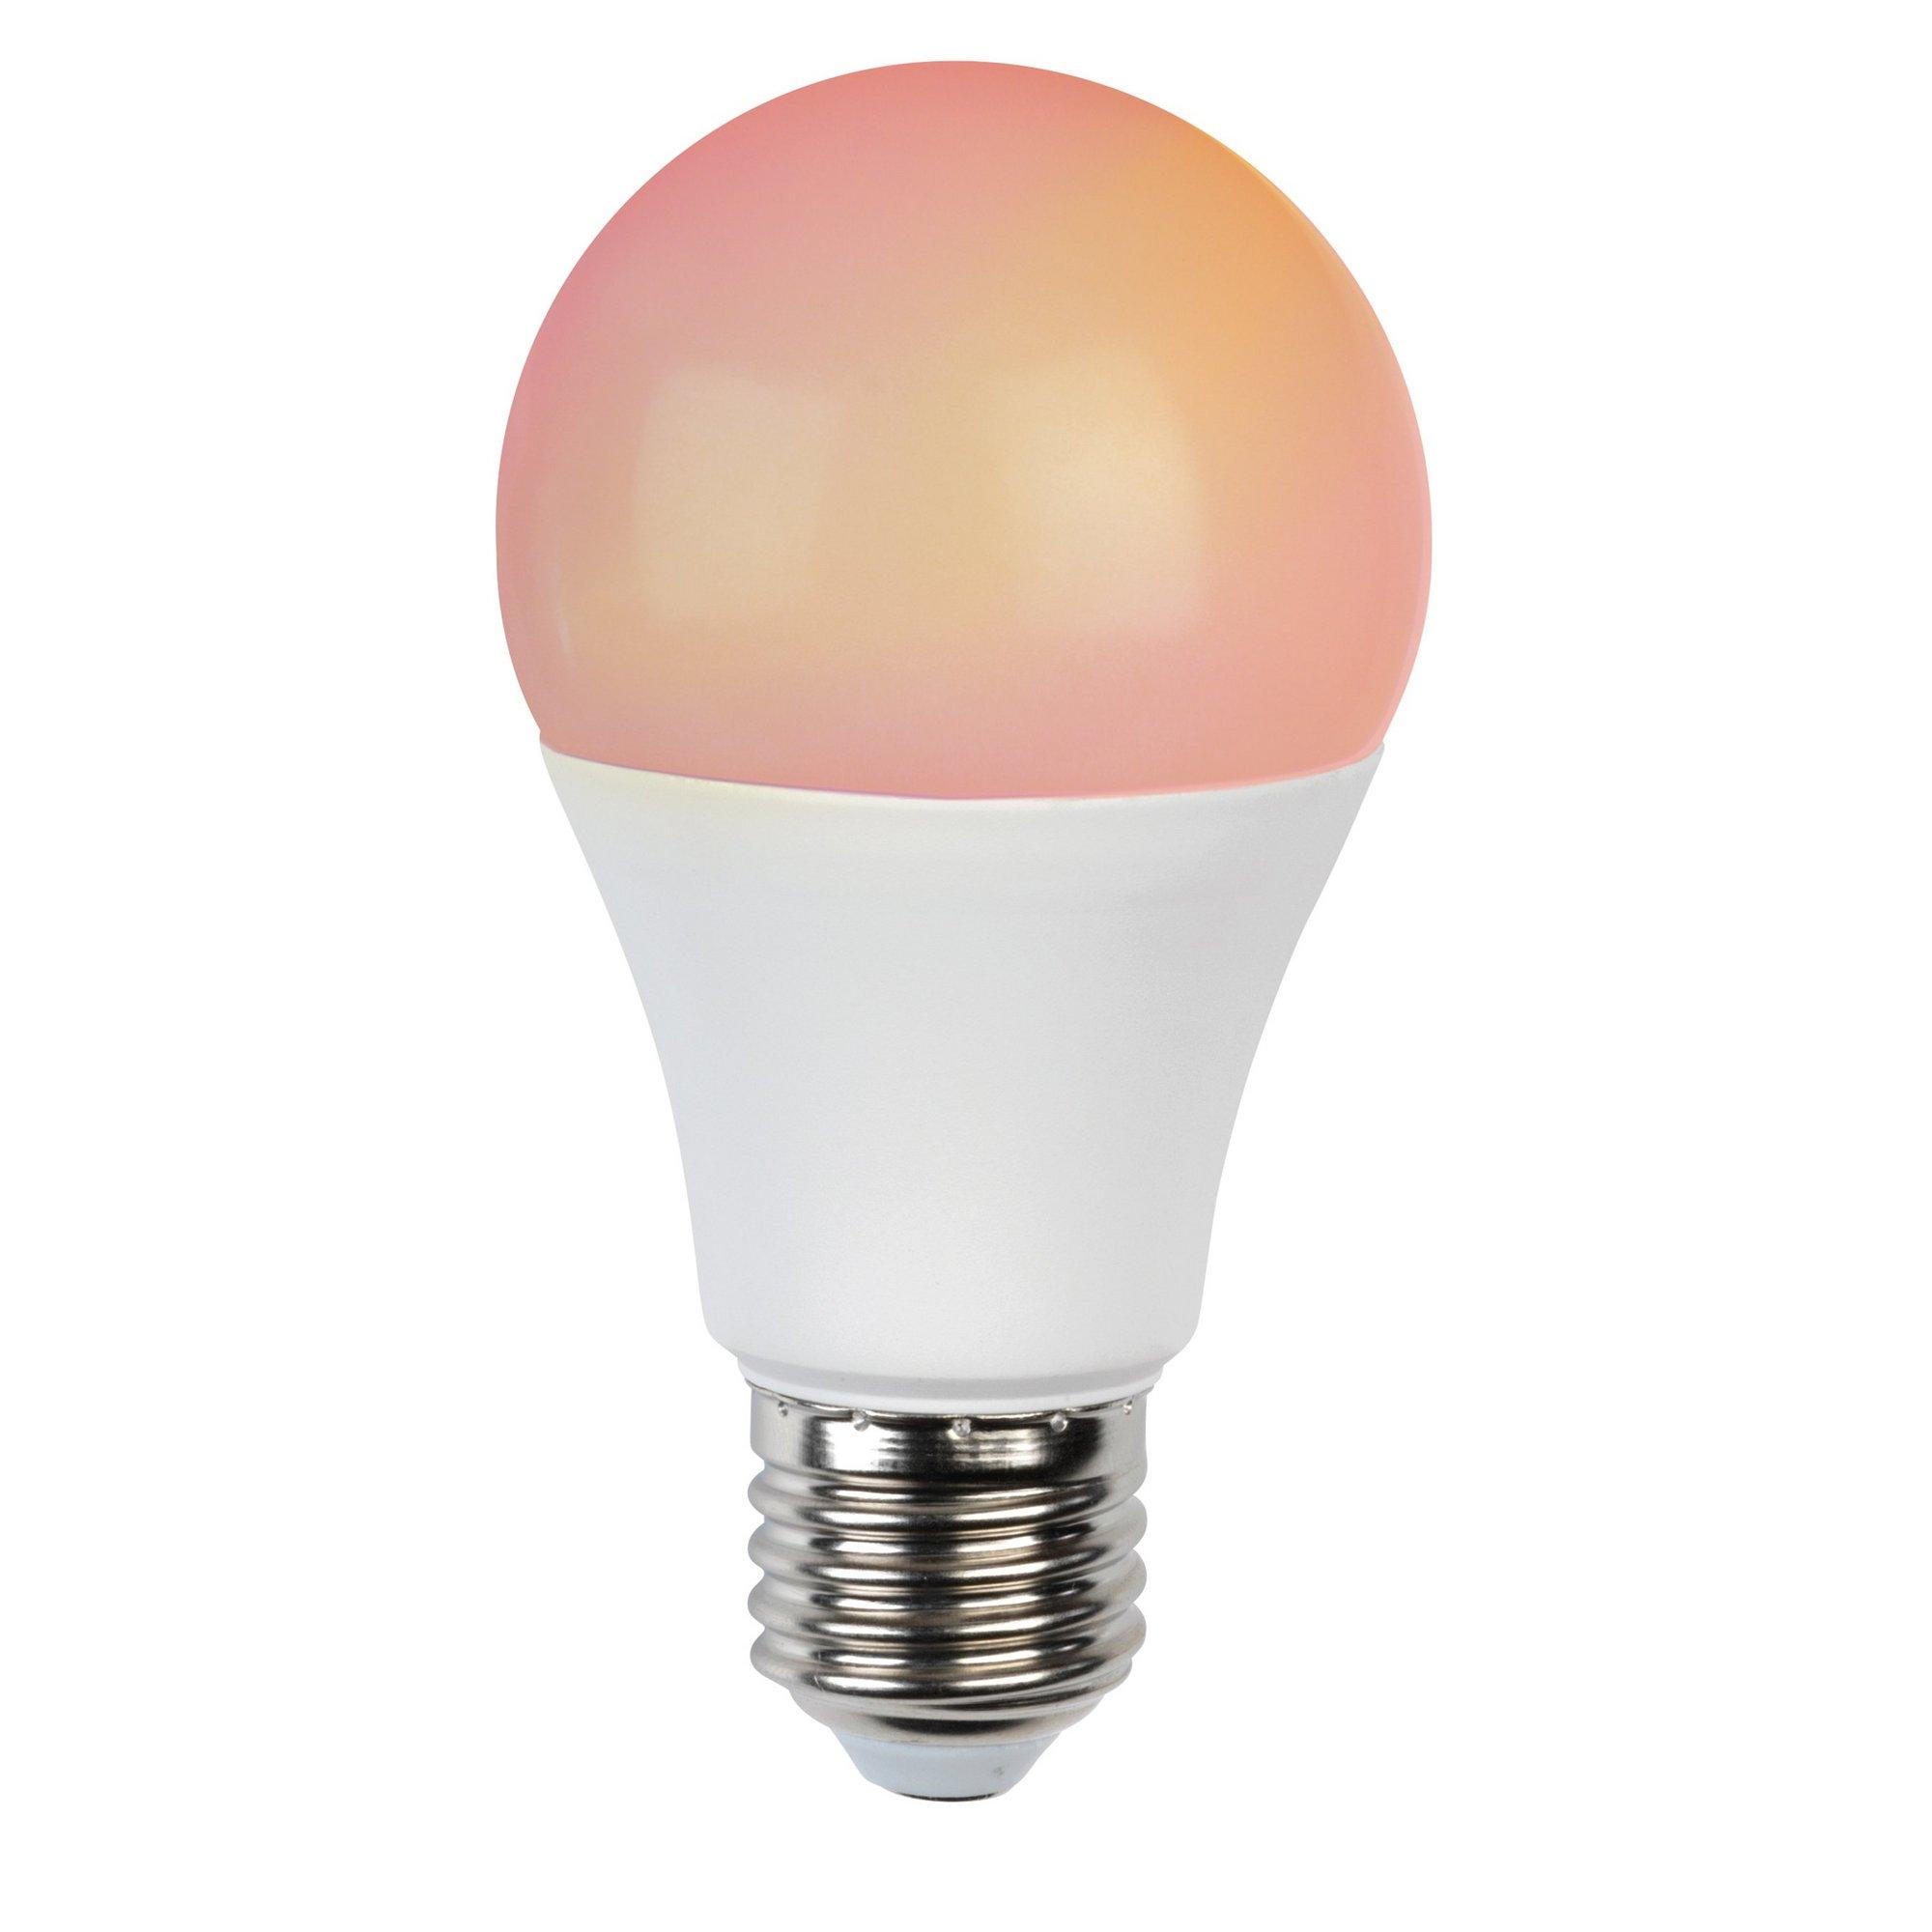 Image of Intempo Home Smart Light Bulb - Bayonet